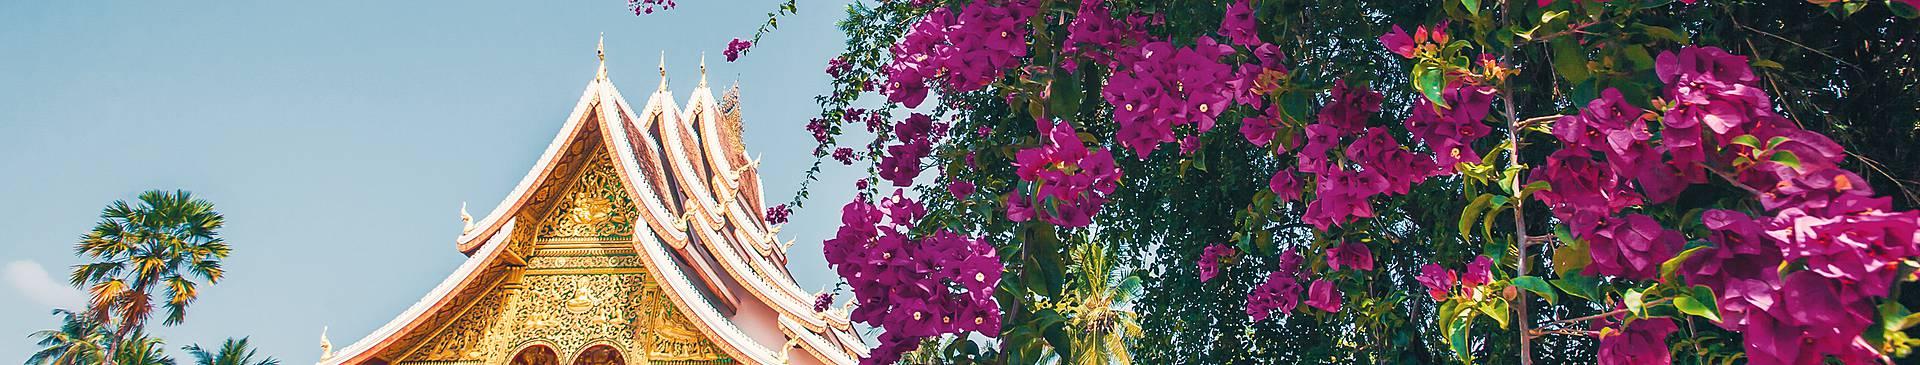 Summer in Laos